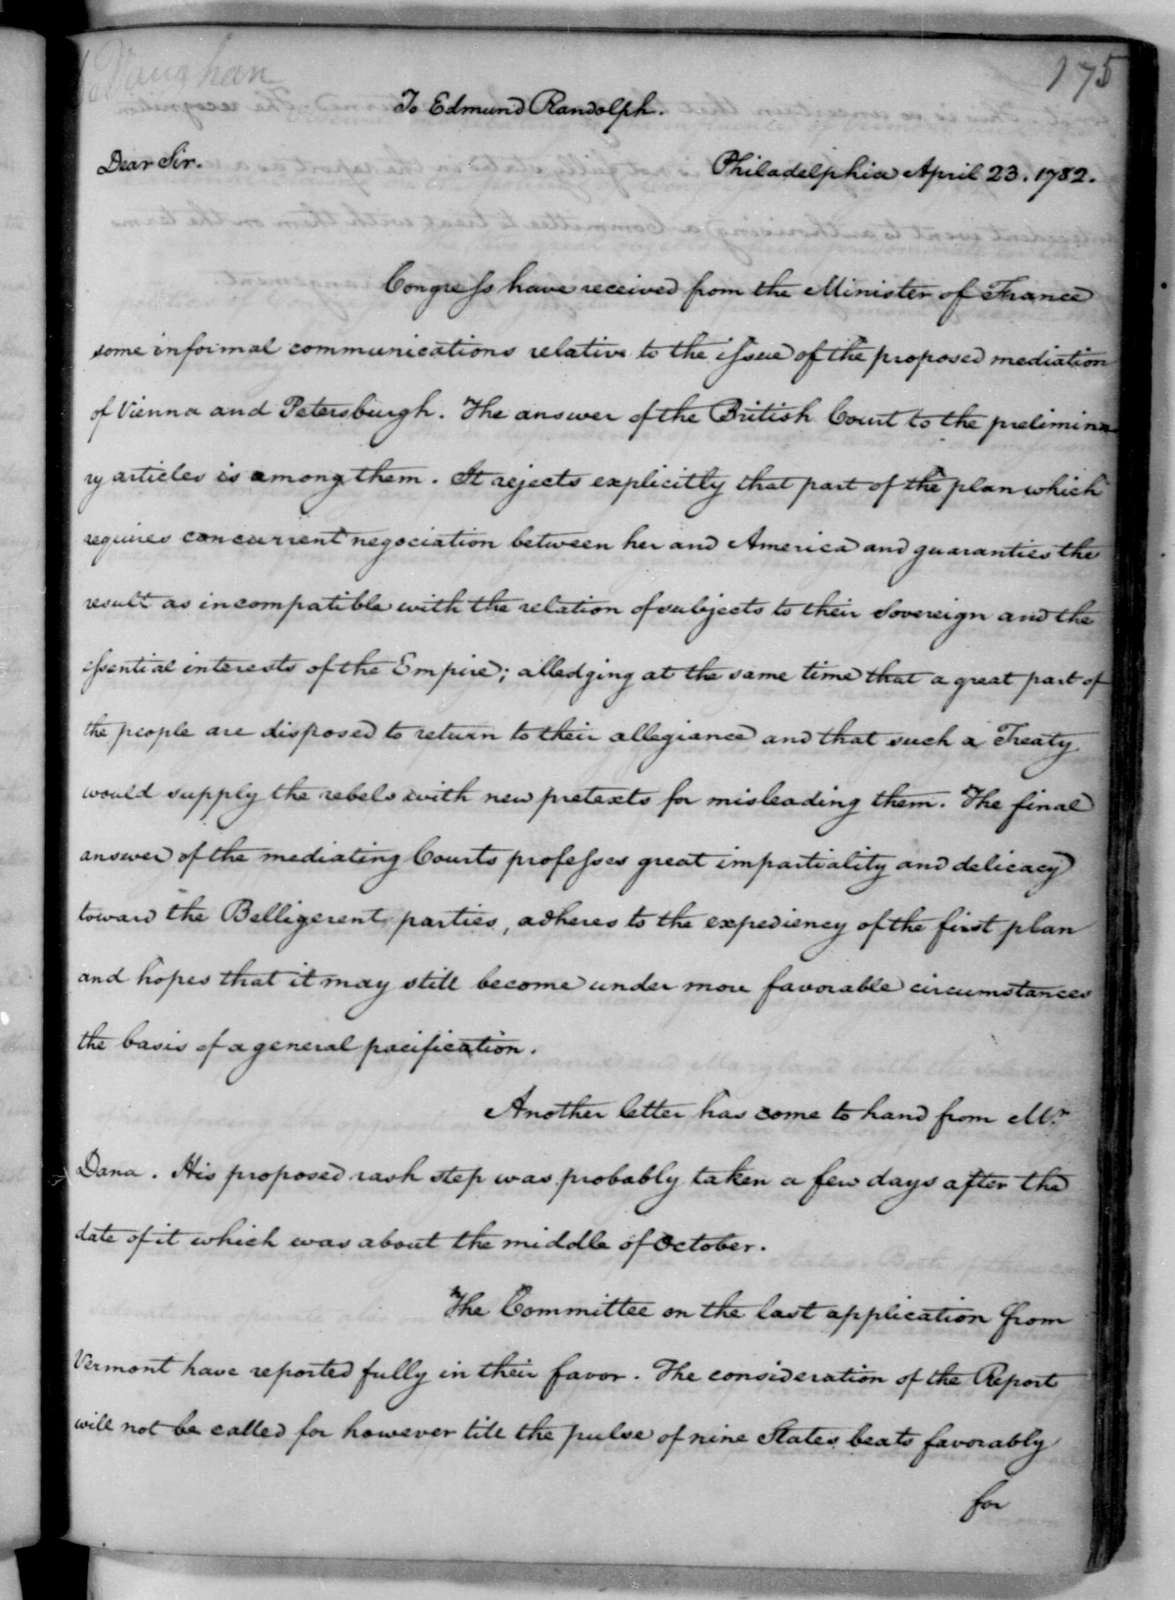 James Madison to Edmund Randolph, April 23, 1782. Notes.